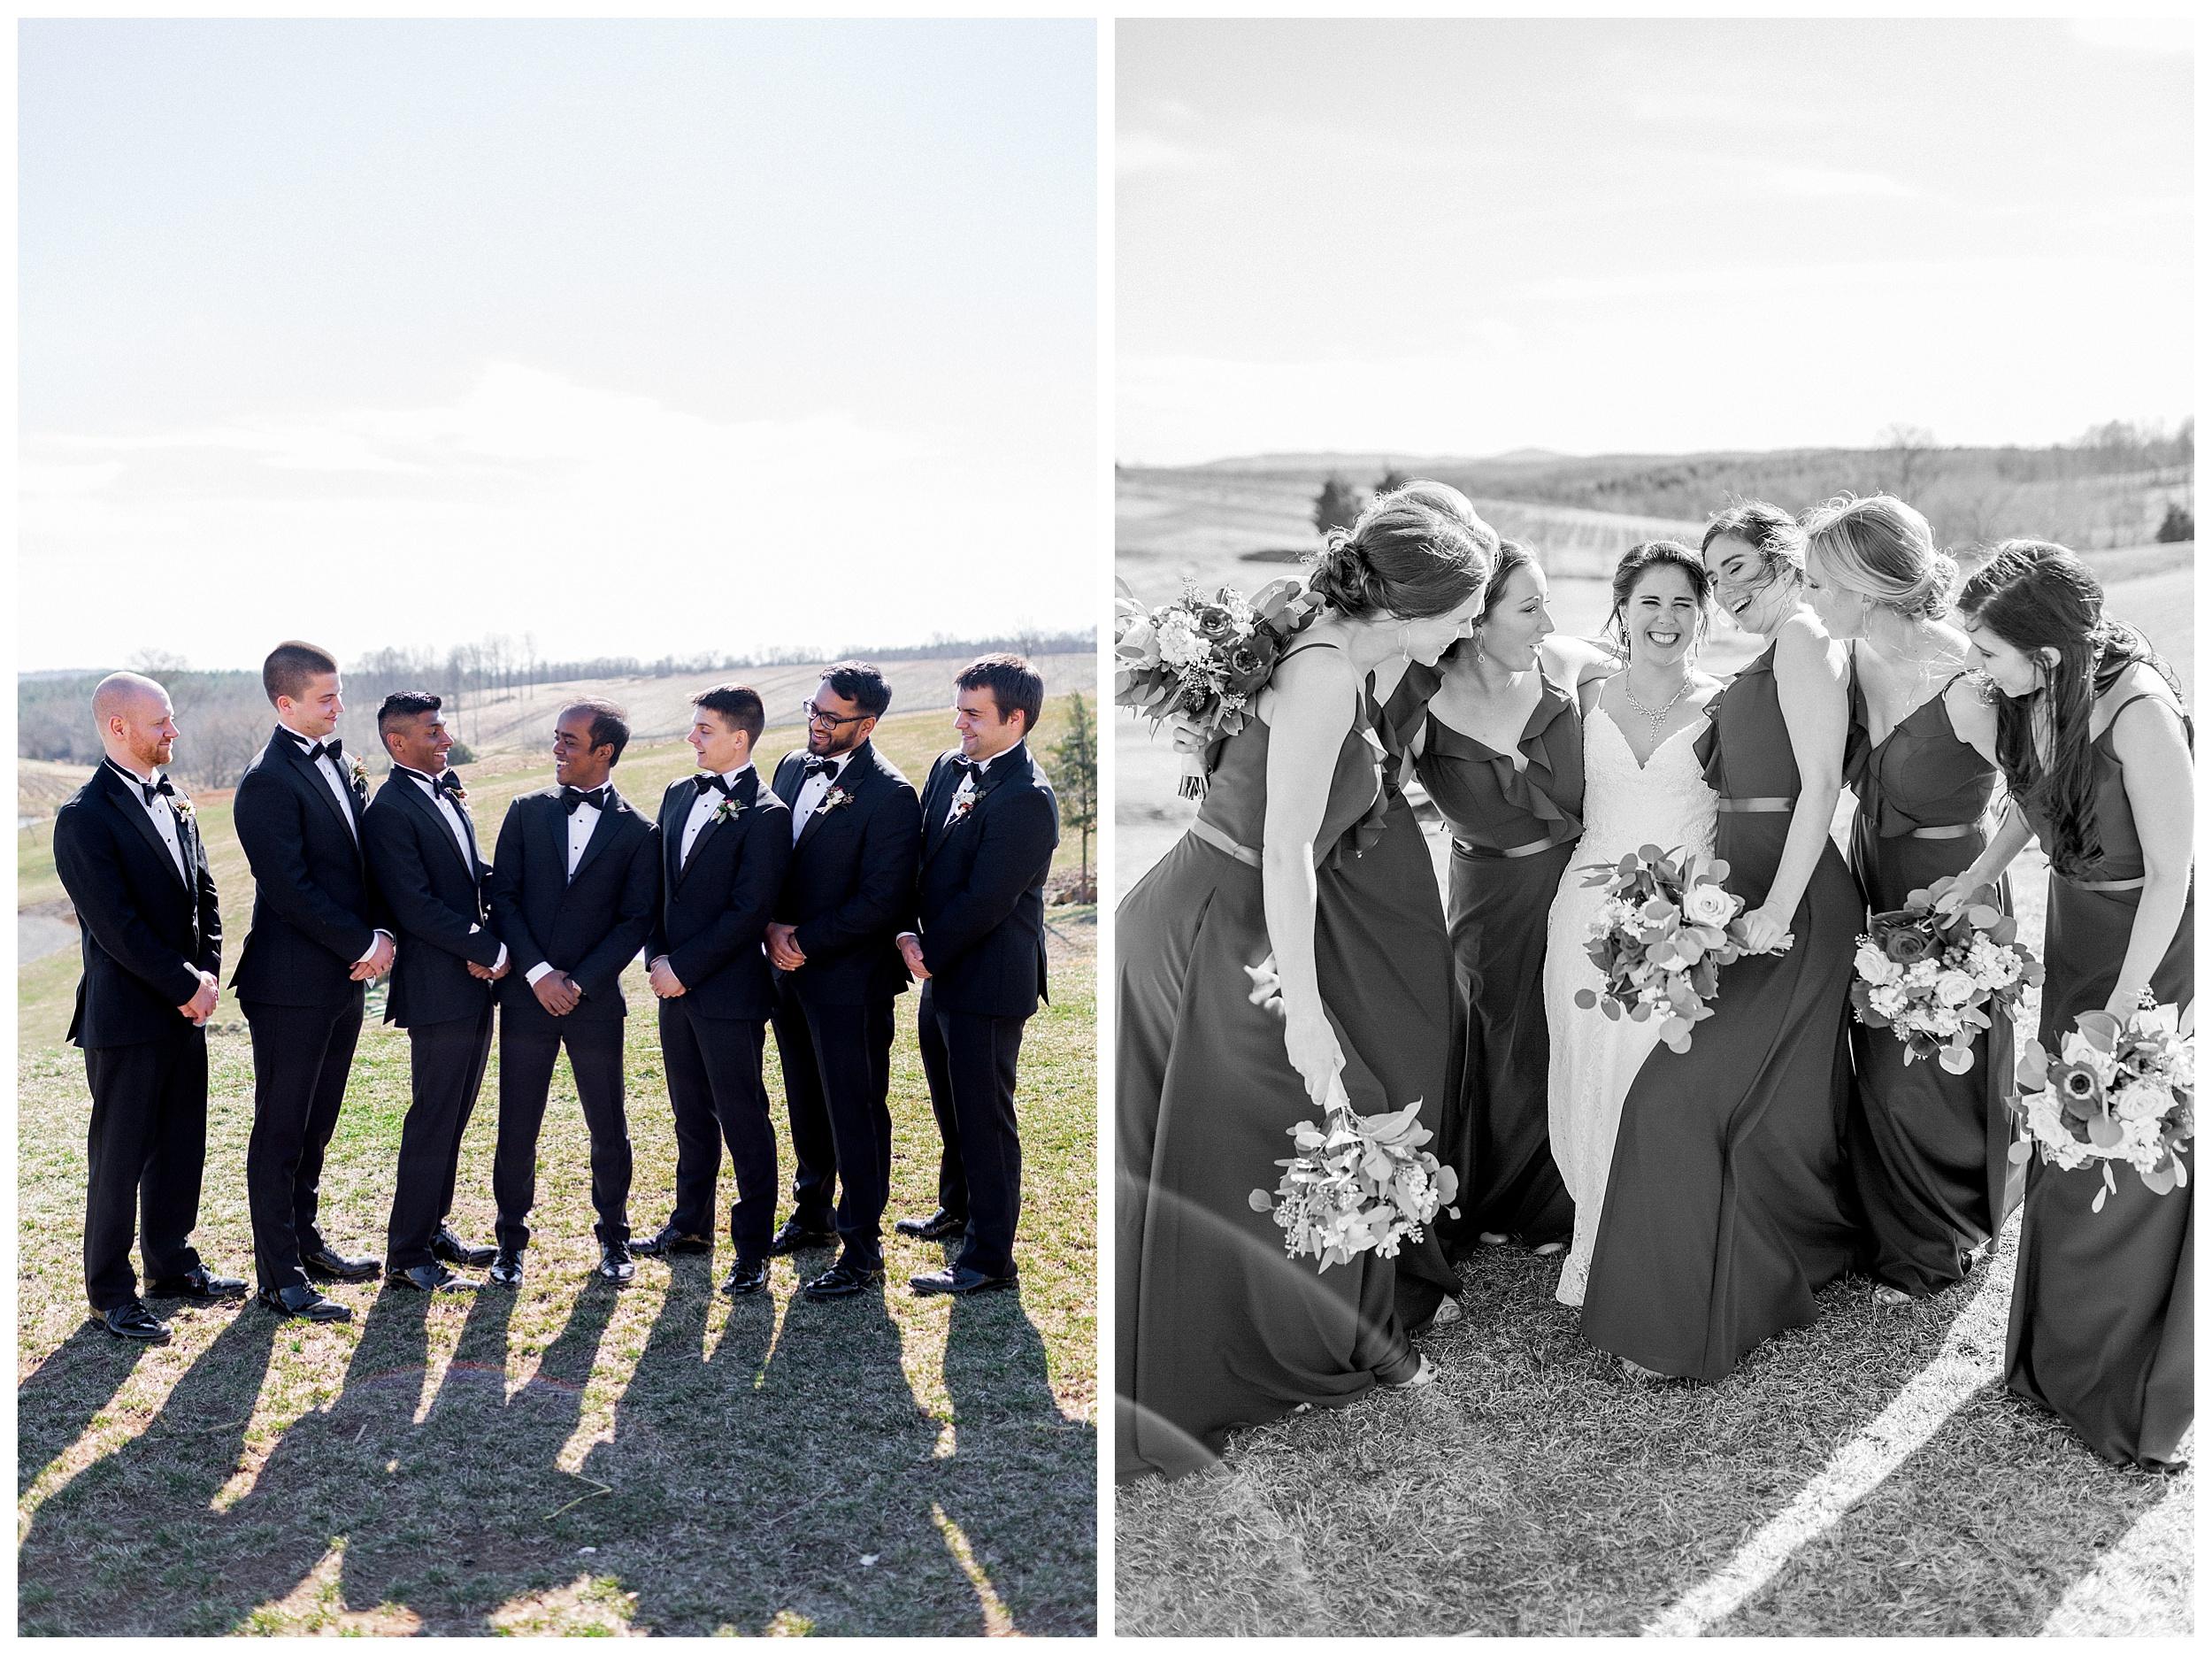 Stone Tower Winery Wedding | Virginia Winter Wedding | VA Wedding Photographer Kir Tuben_0071.jpg